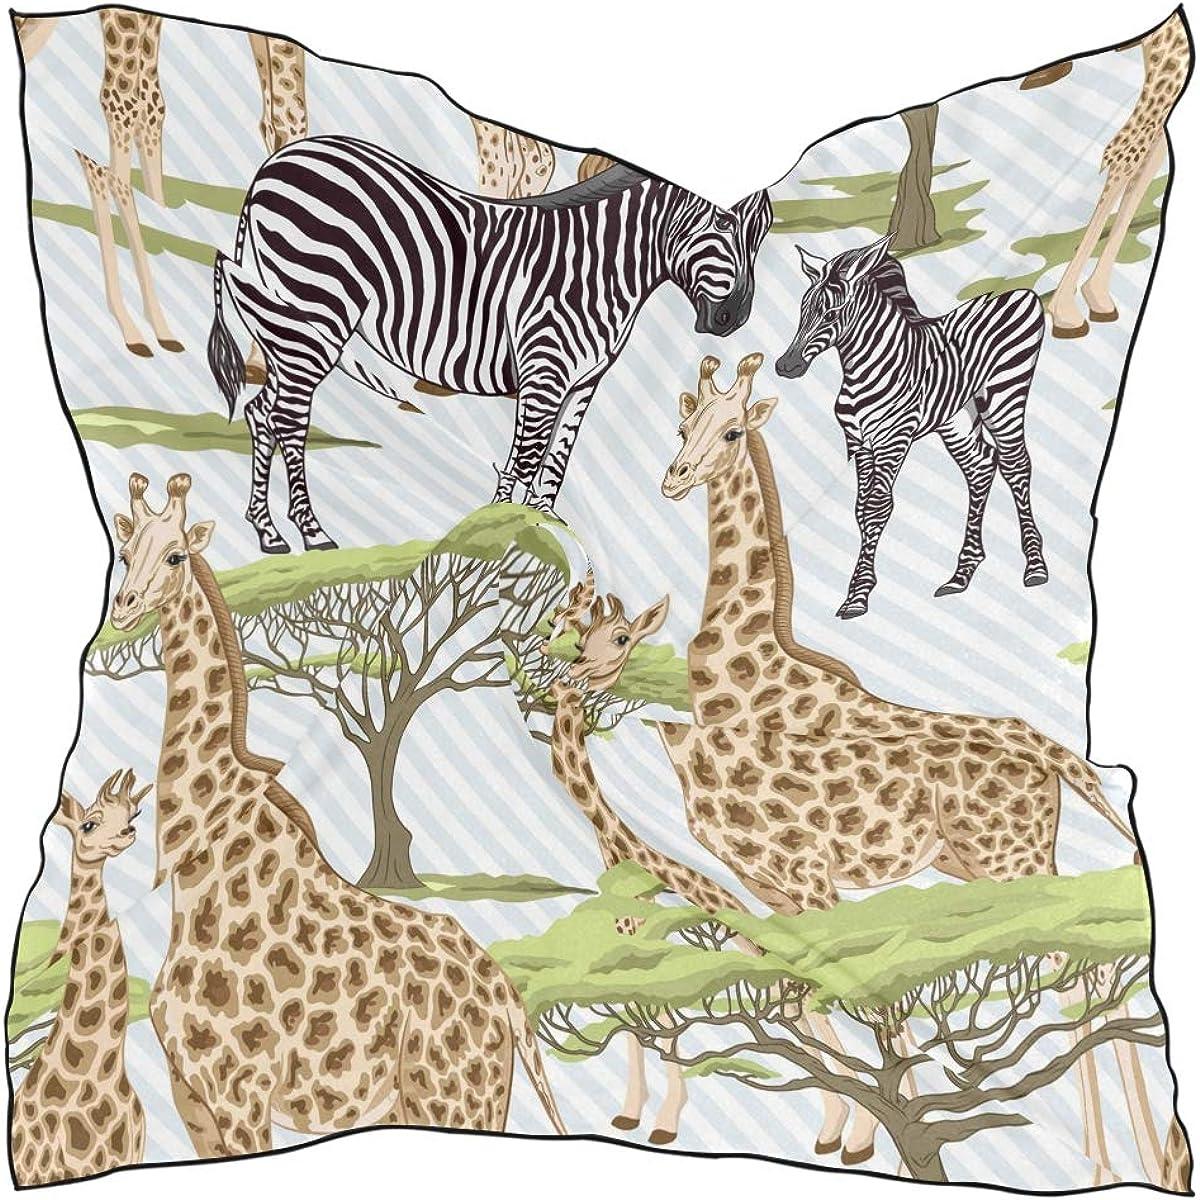 XLING Fashion Square Scarf Geometric Animal Giraffe Zebra Lightweight Sunscreen Scarves Muffler Hair Wrap Headscarf Neckerchief for Women Men